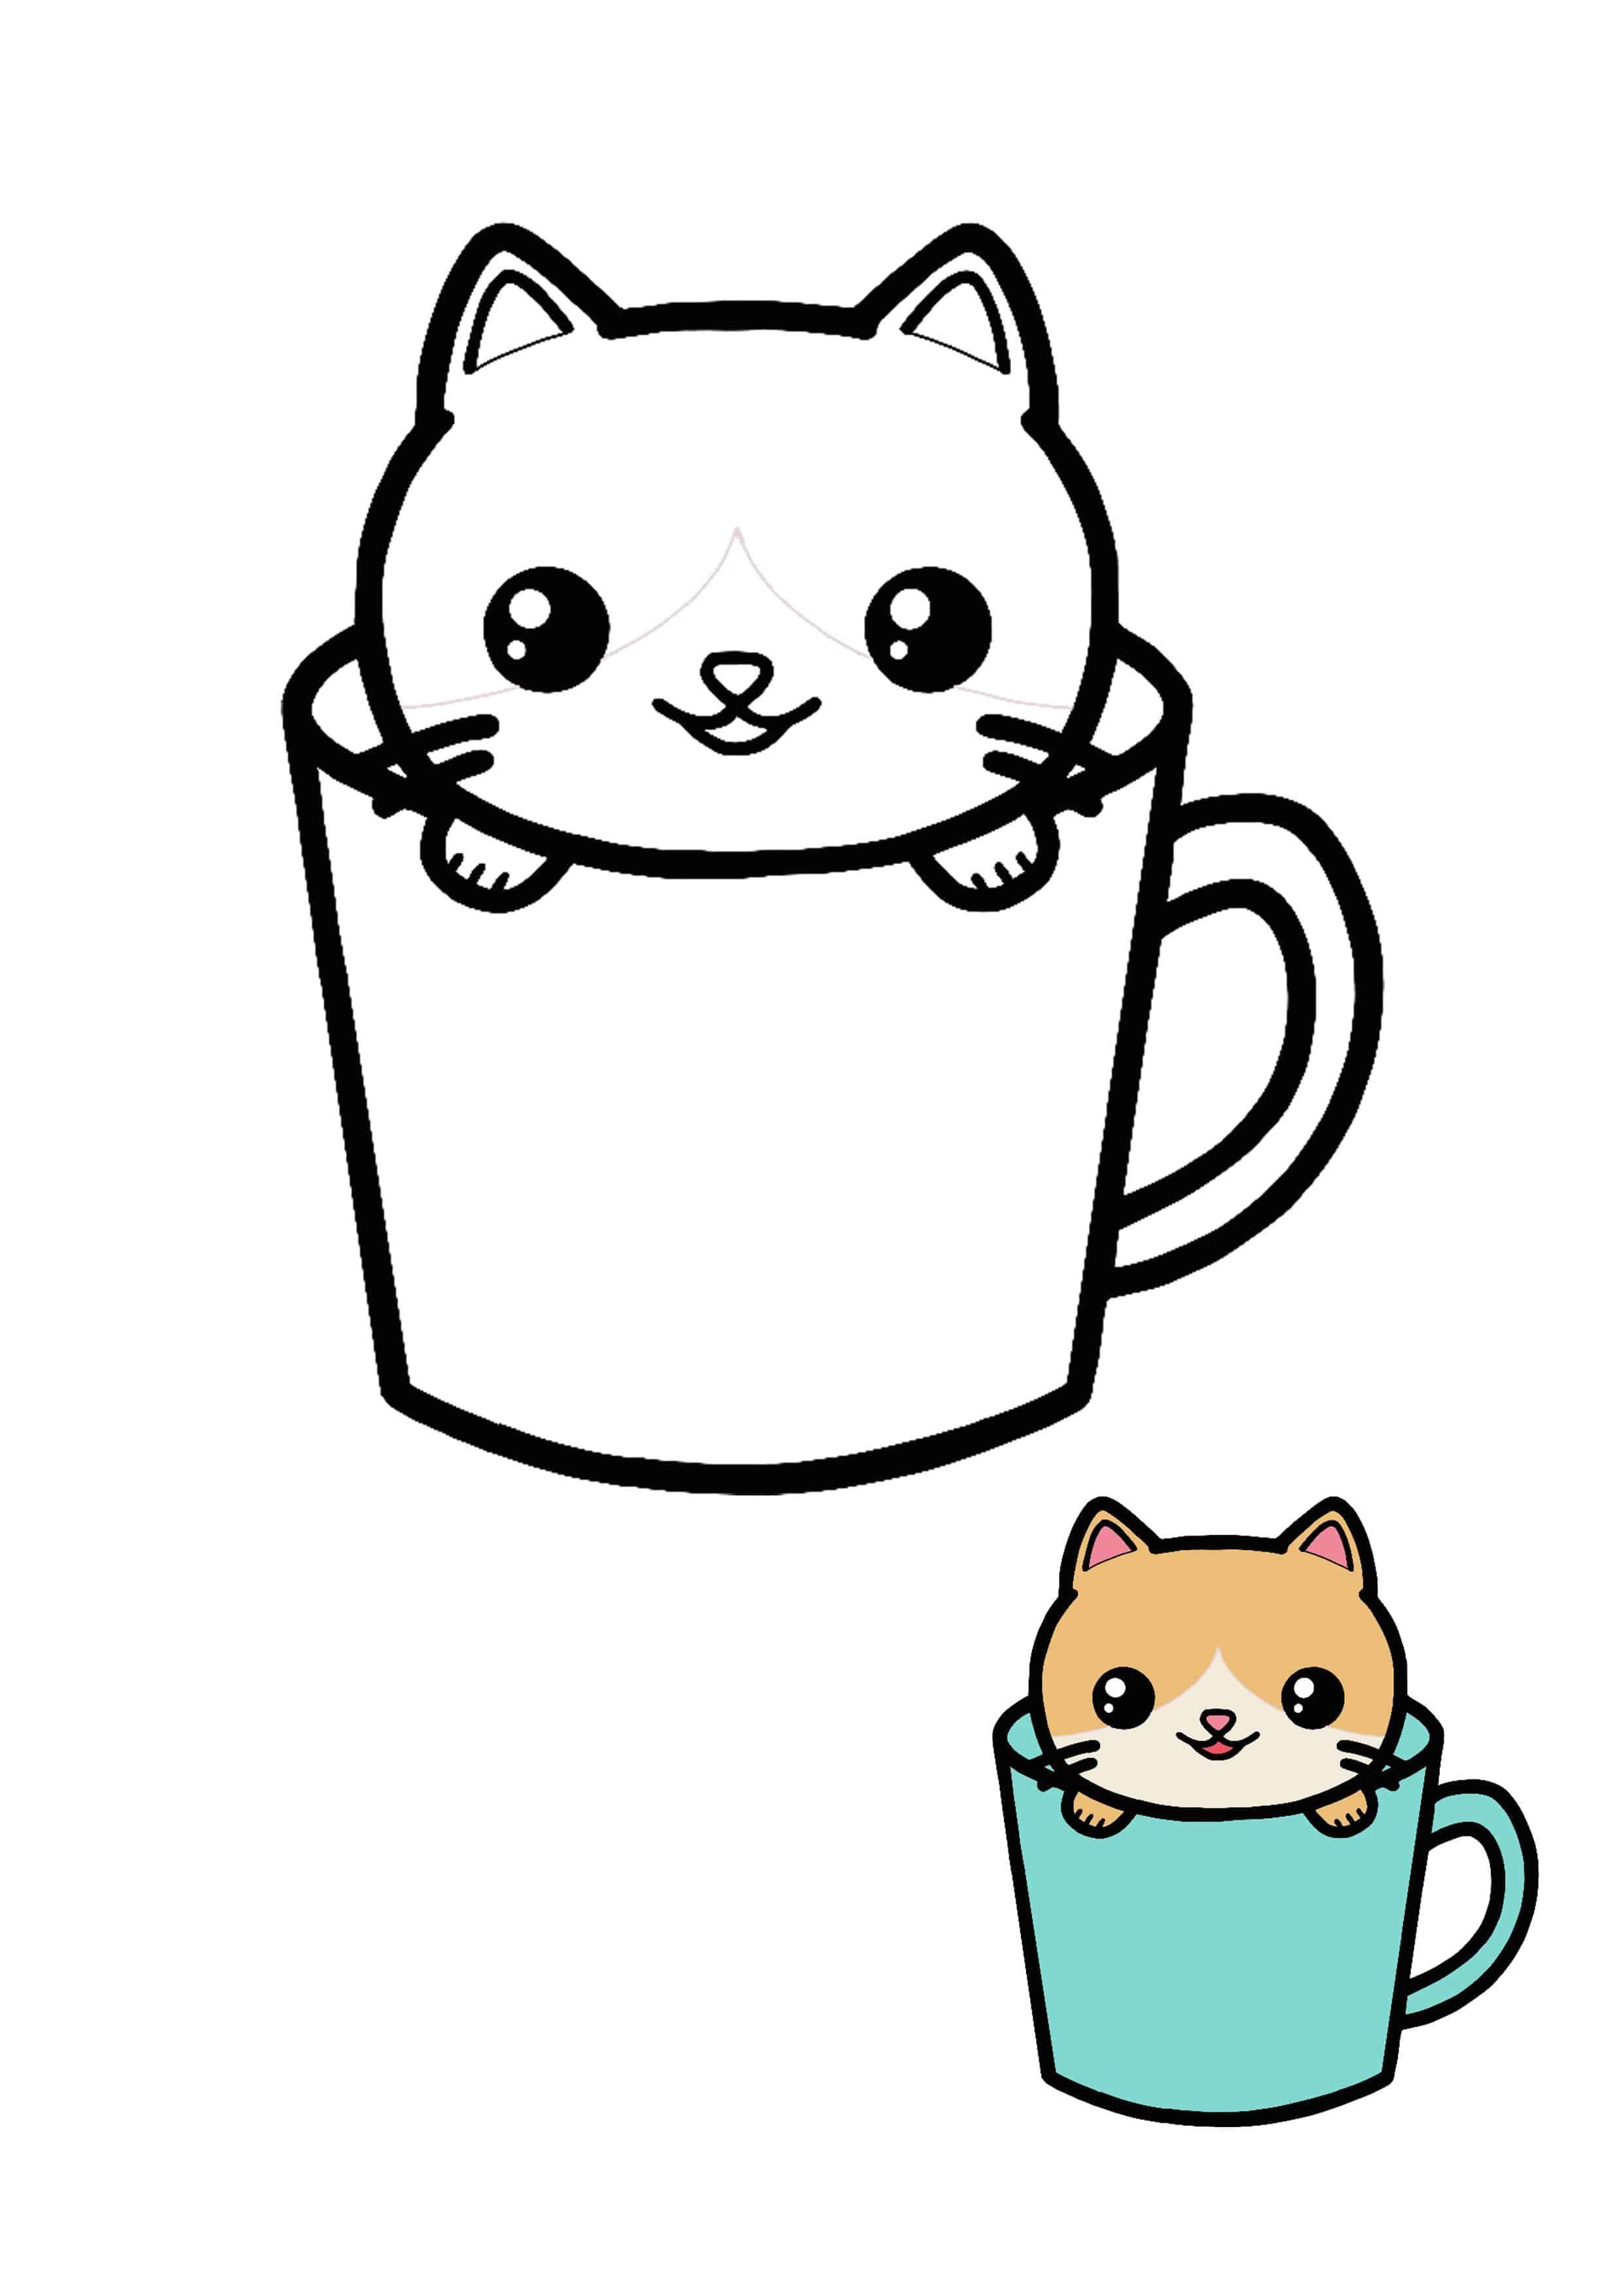 Kawaii Cat Teacup Coloring Page For Kids Manga Coloring Book Cat Coloring Page Kawaii Cat